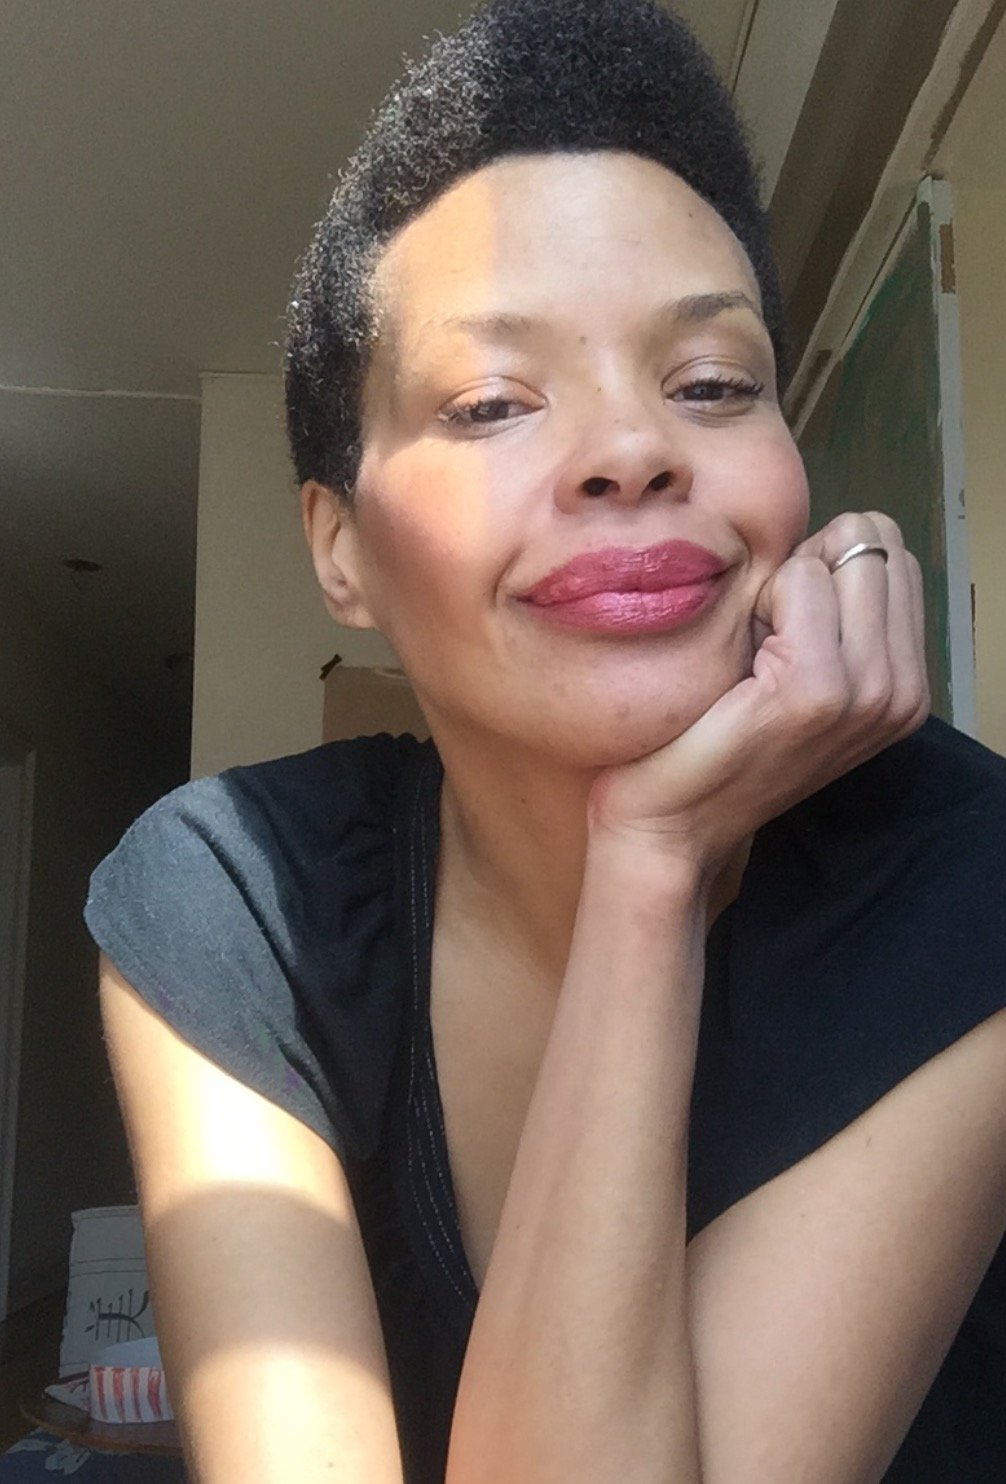 Former 'The Apprentice' Star Stacie J. On Surviving A Ruptured Brain Aneurysm